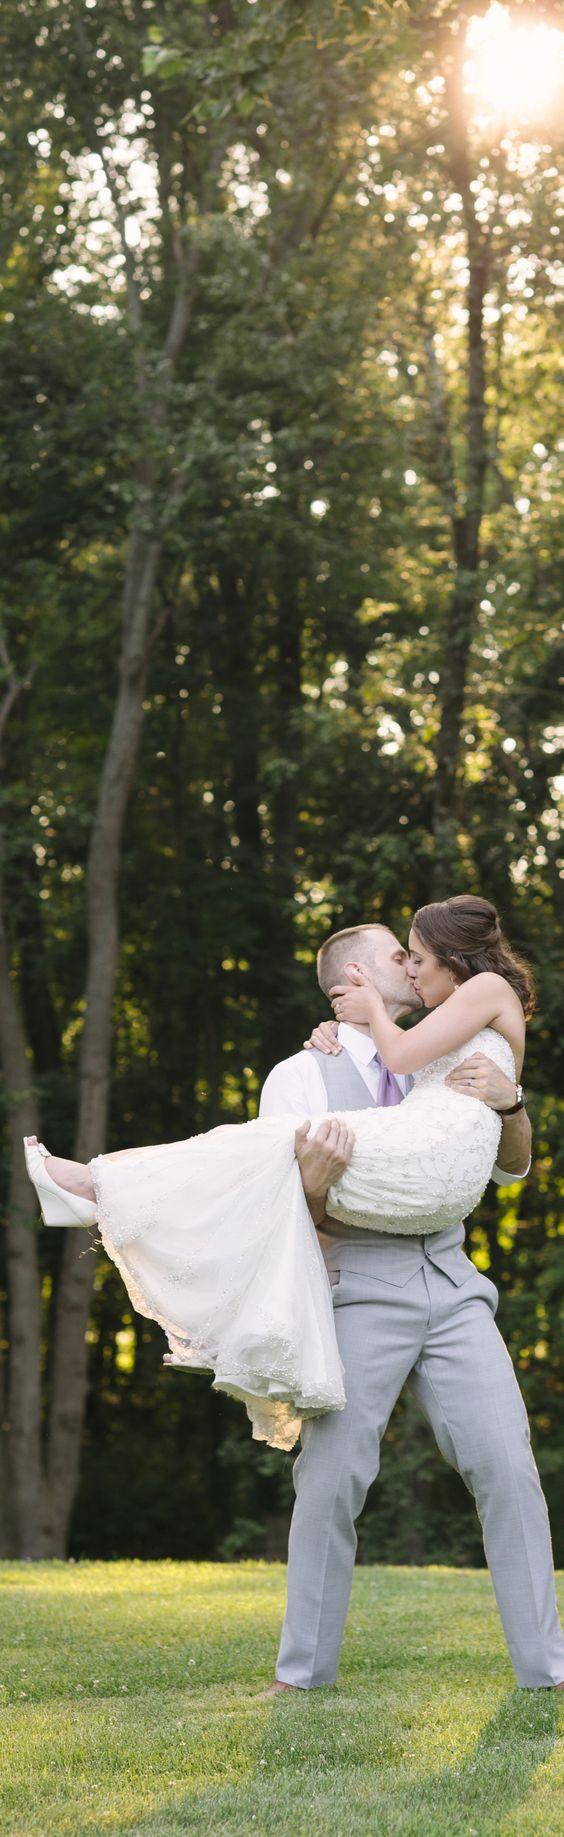 The kind of wedding shot you must frame! Photo by http://aliciakingphotography.com Brides shoes http://ninashoes.com/rivka-ivory-luster-satin--17783?c=806&utm_source=Pinterest&utm_medium=Social%20Media%20Campaign&utm_term=Wedding%20Inspiration%20&utm_content=%20wedding%20poses%20sun%20Alicia%20King%20CR&utm_campaign=Wedding